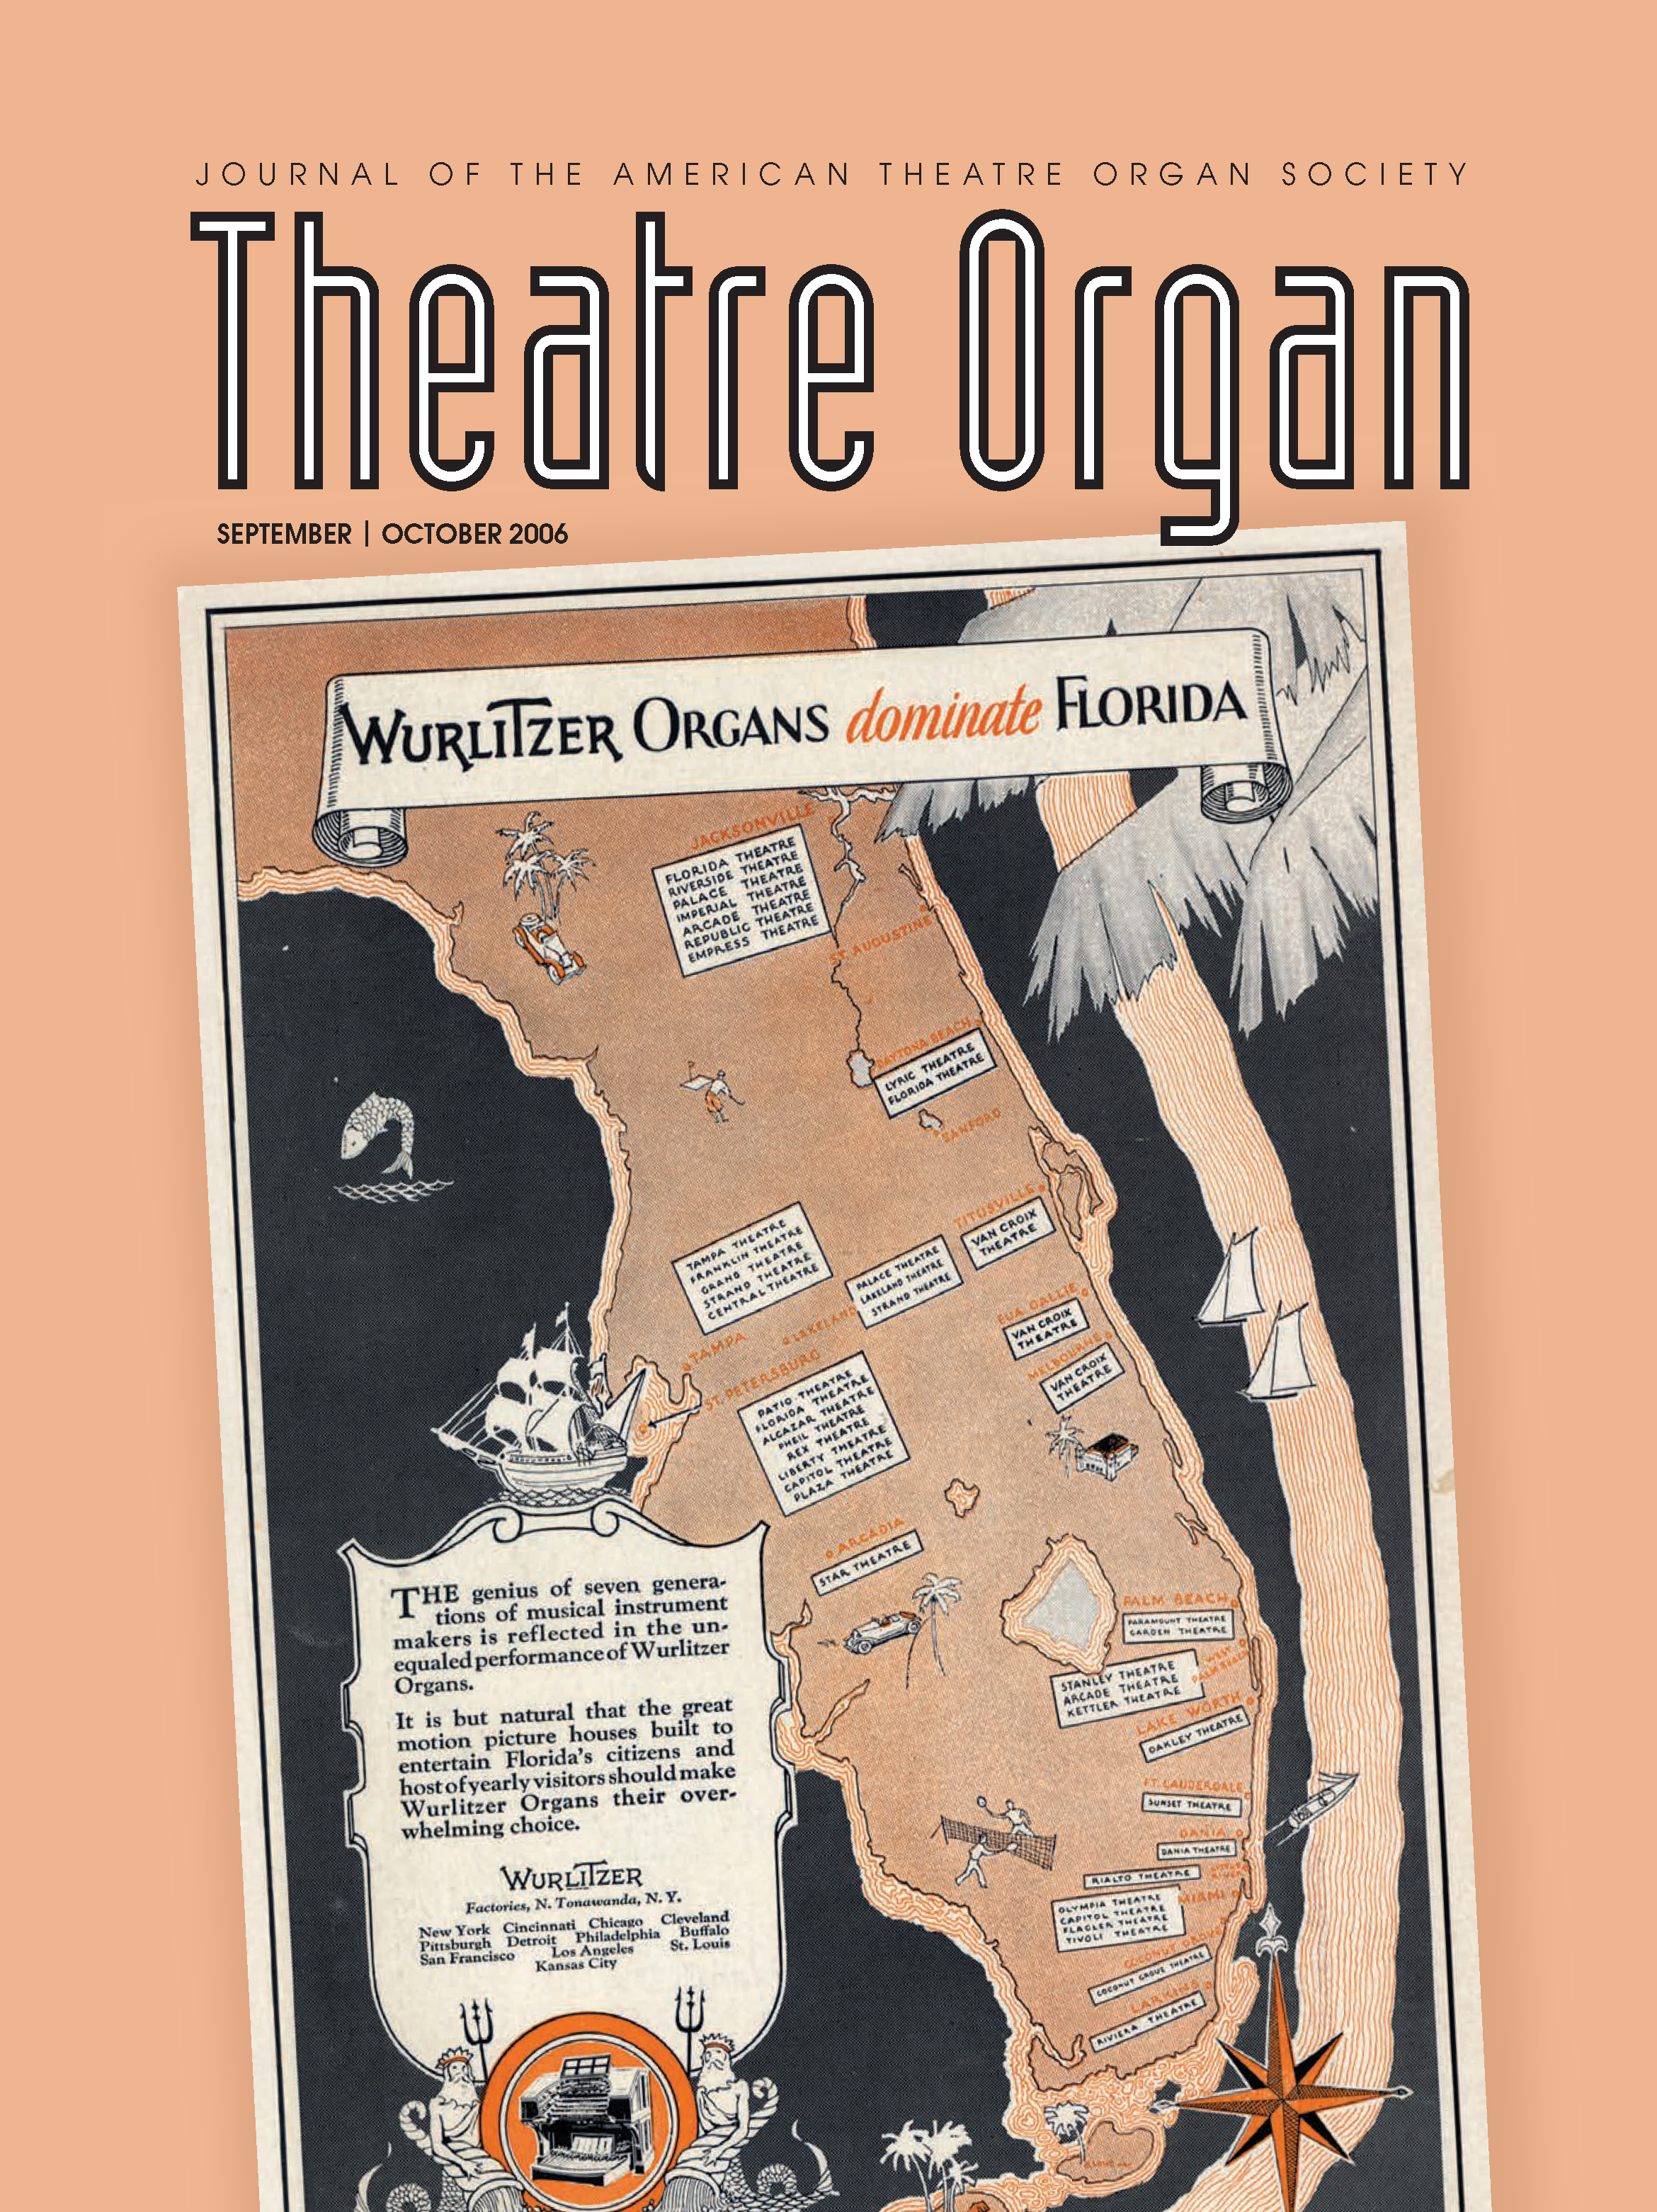 Theatre Organ, September - October 2006, Volume 48, Number 5